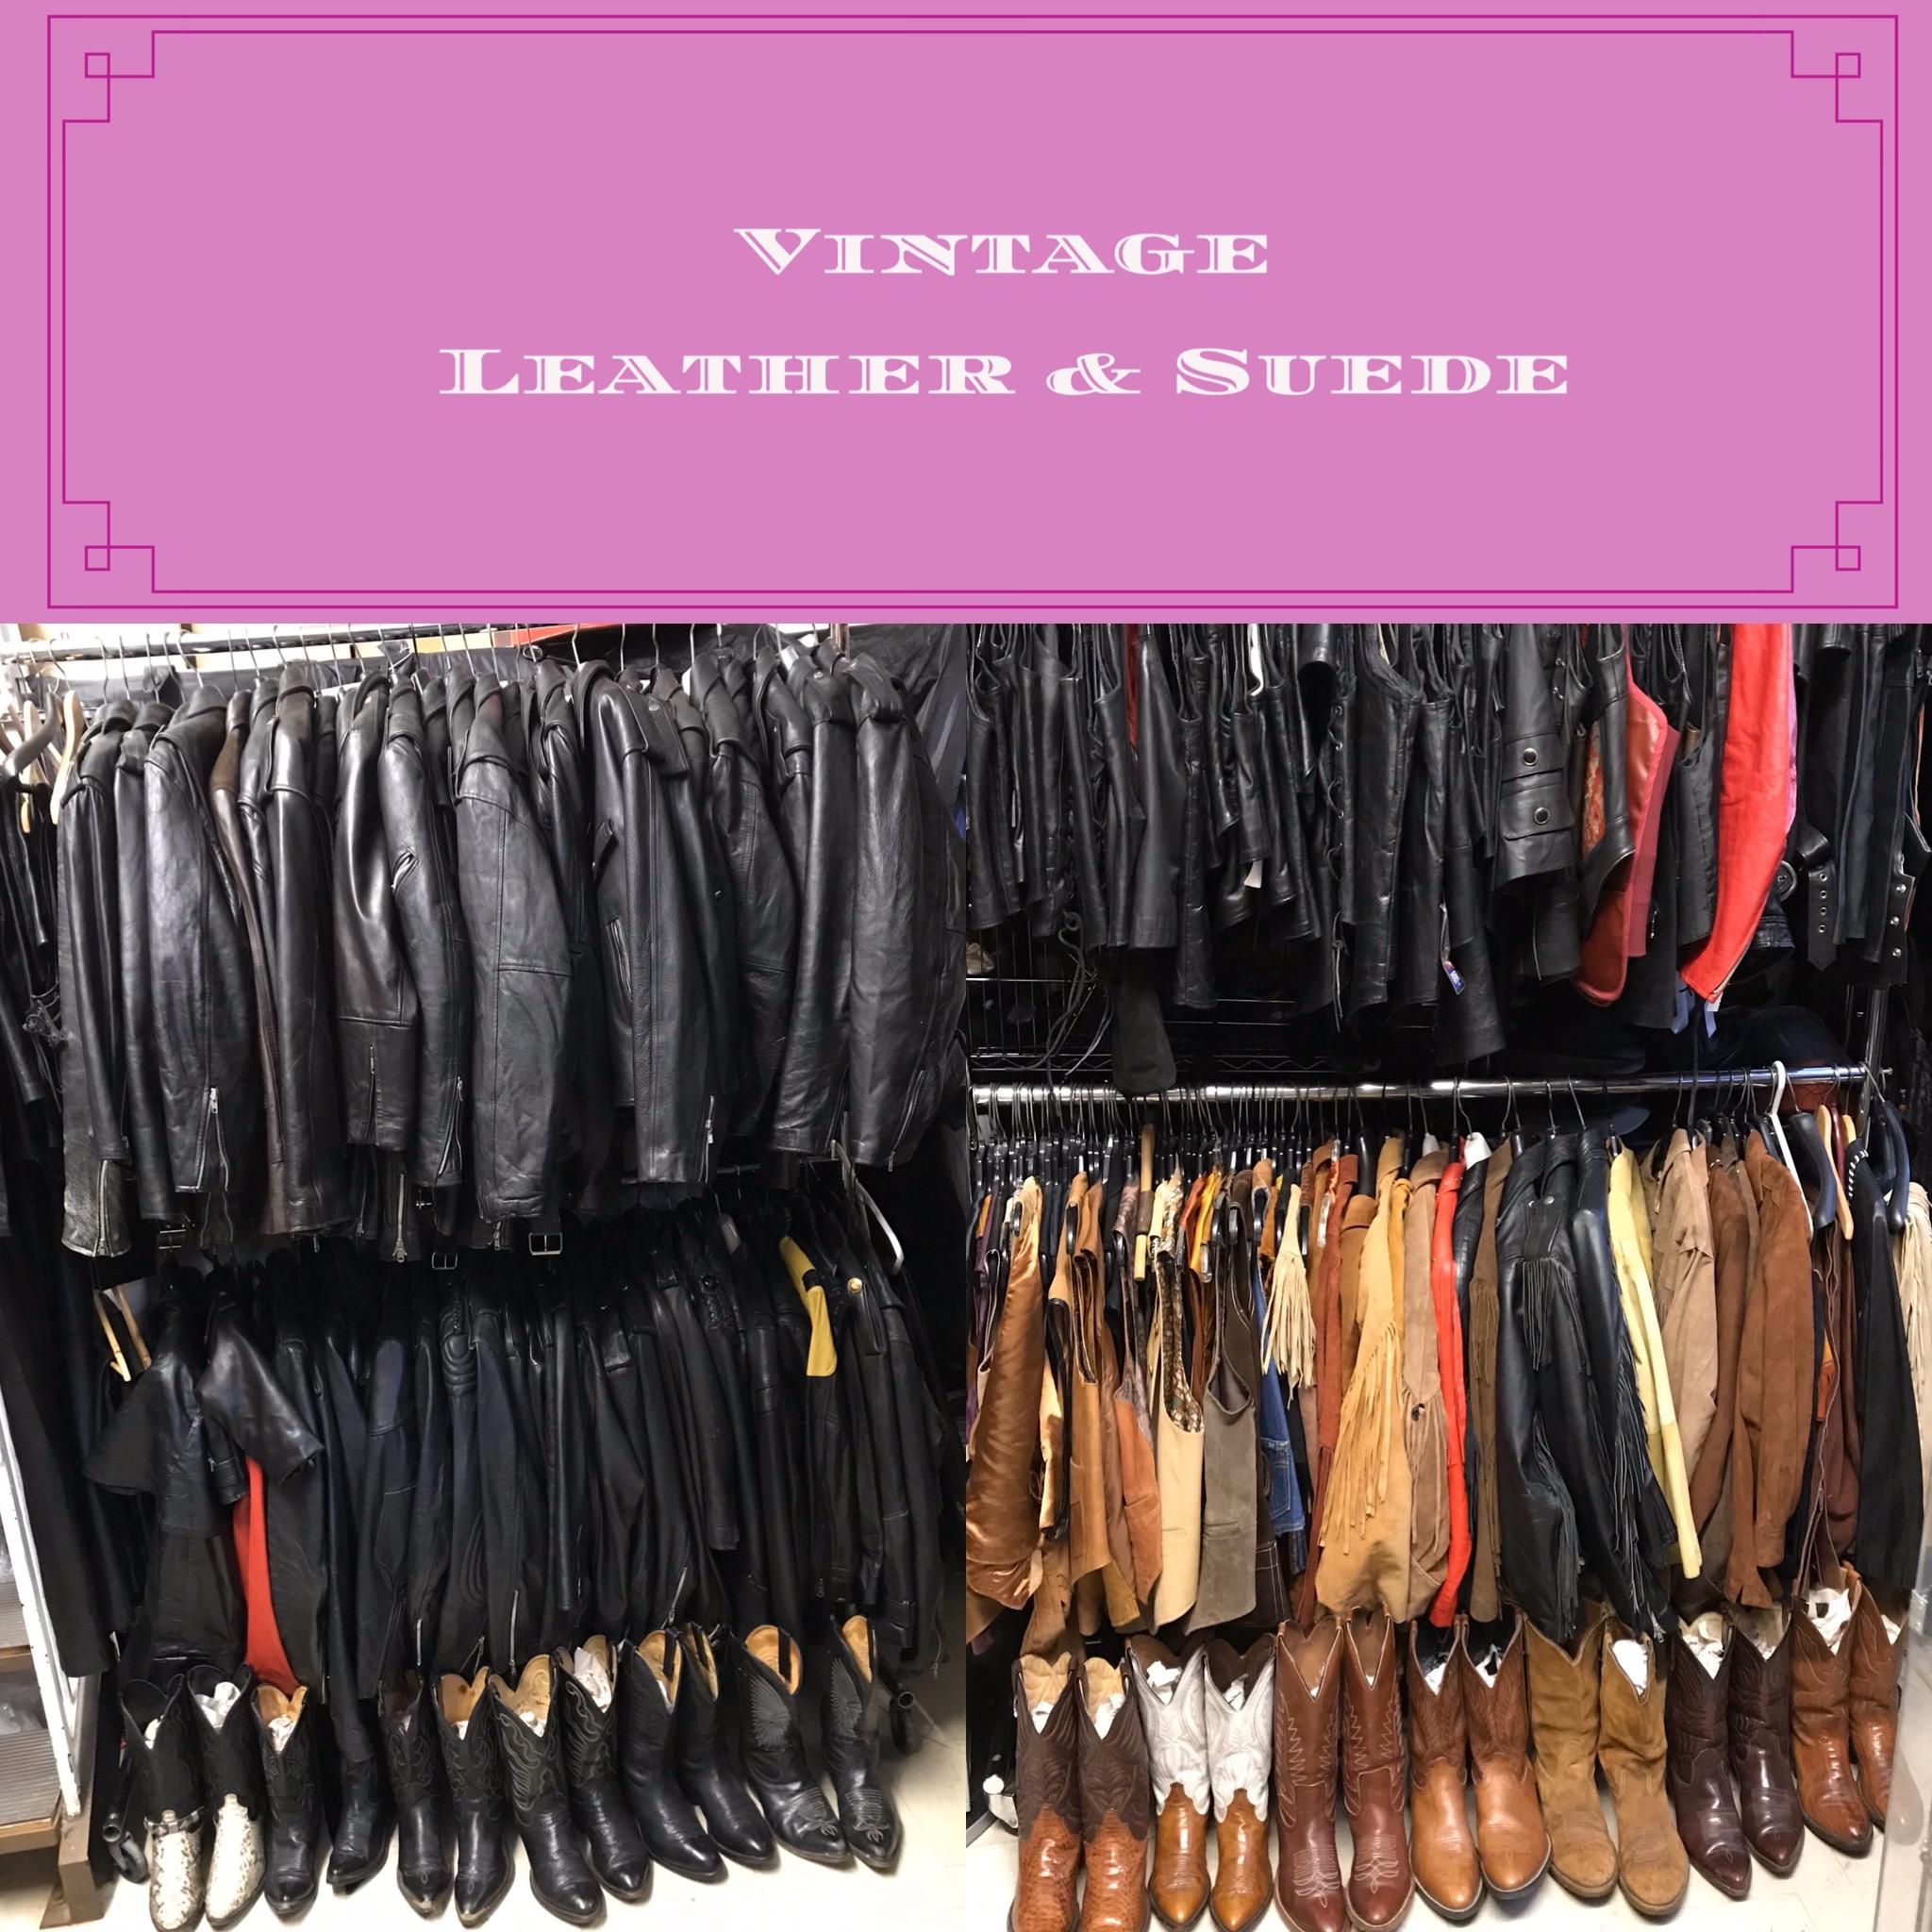 Vintage Leathers & Suedes